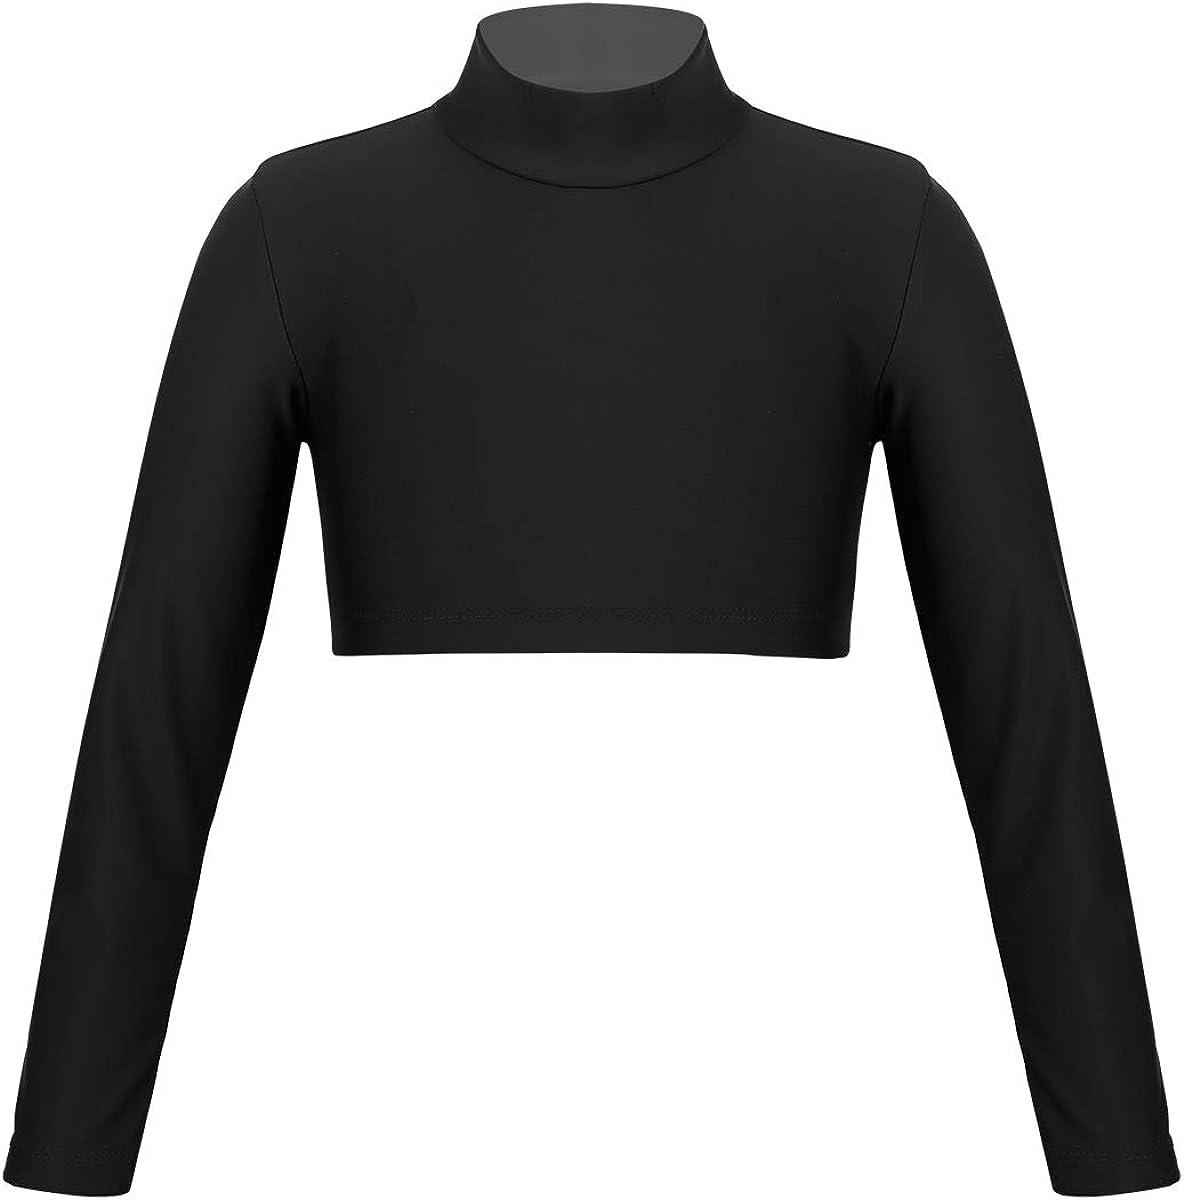 Yartina Ranking TOP7 Kids Girls T-Shirt Crop Regular store Long Tigh Tops Turtleneck Sleeve